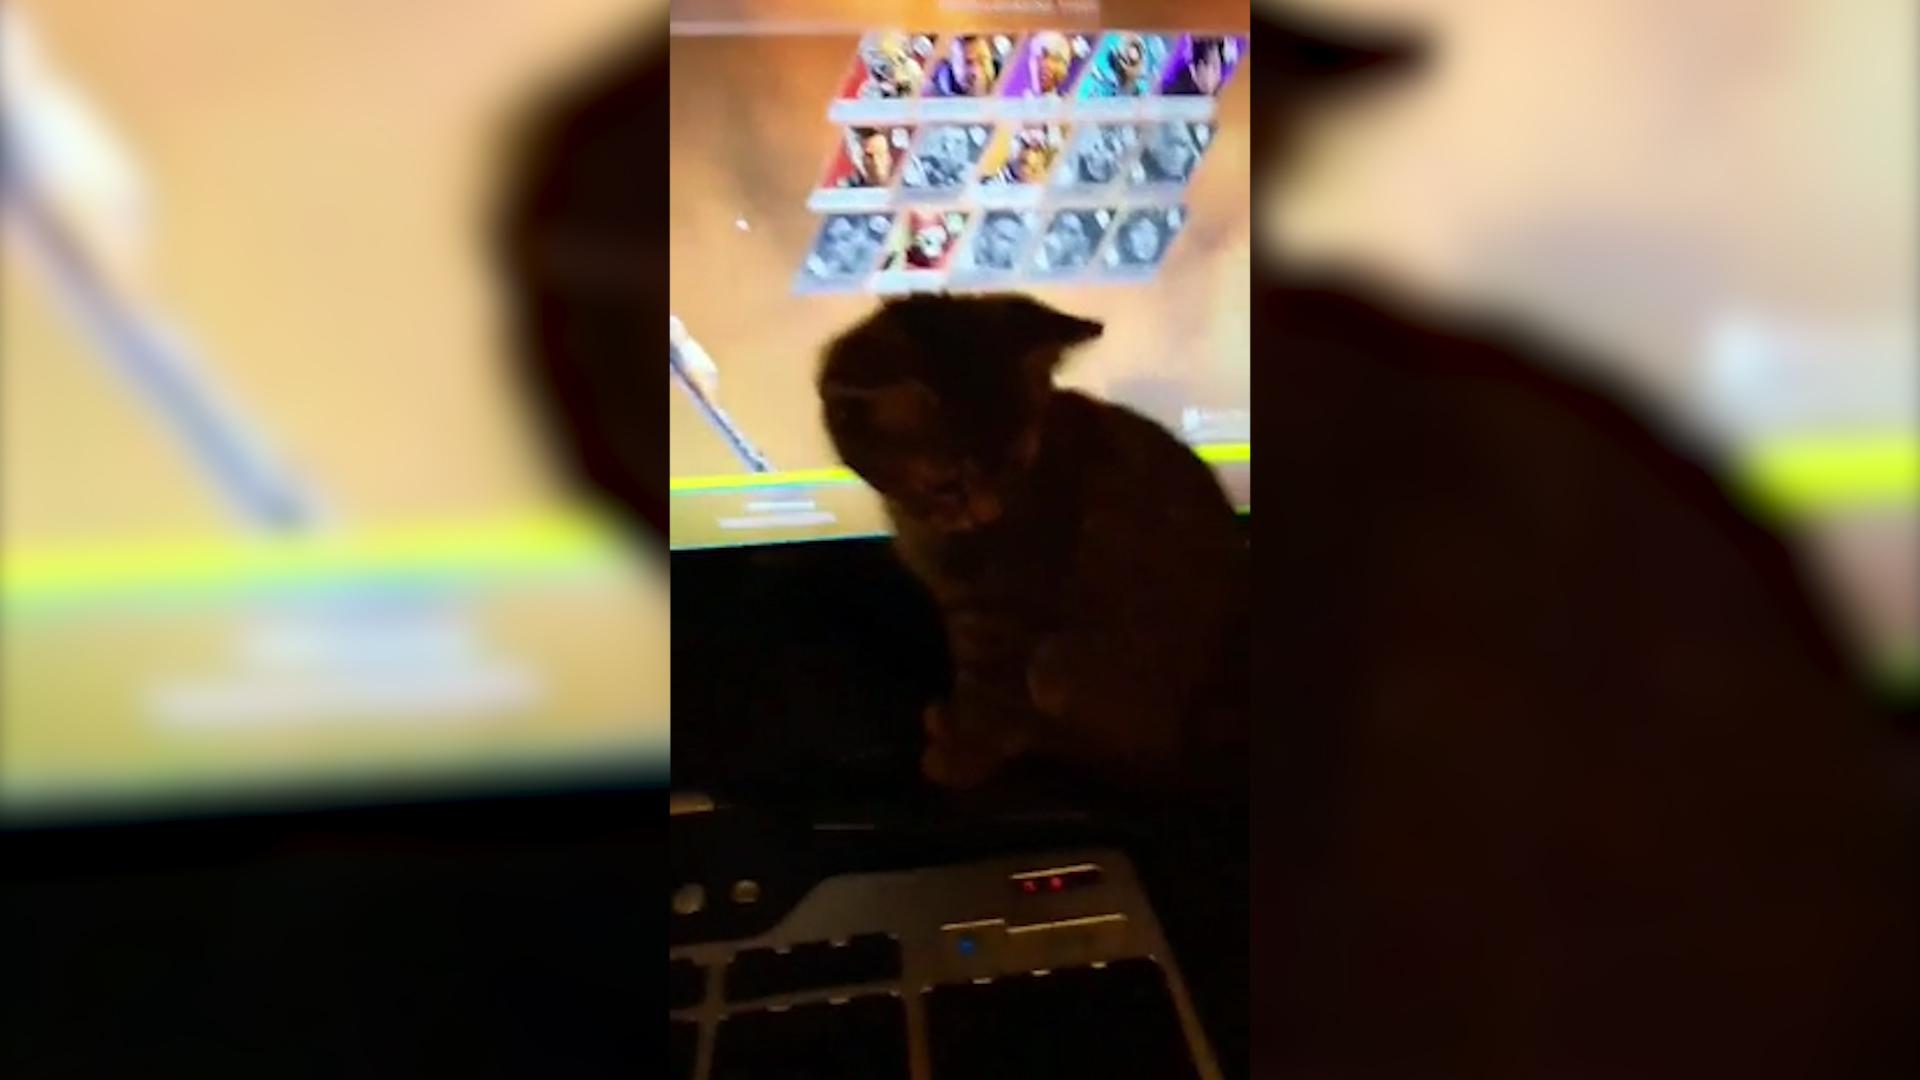 【APEX】プレイ中に邪魔してくる猫が可愛すぎるwww